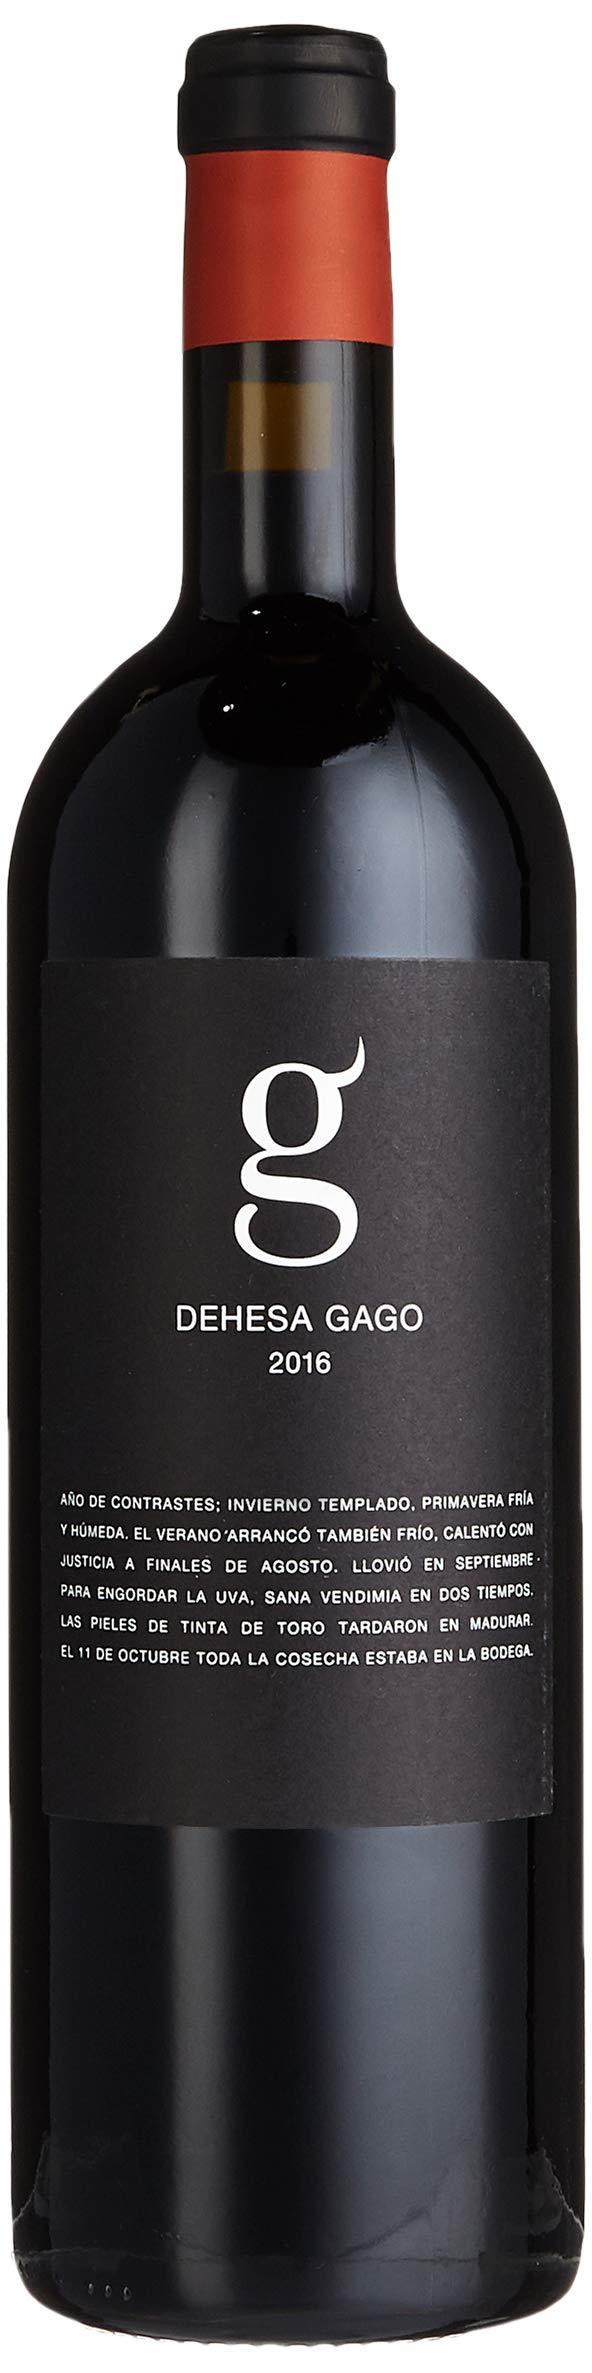 Telmo-Rodriguez-Dehesa-Gago-Tintade-Toro-DO-20152016-Trocken-6-x-075-l